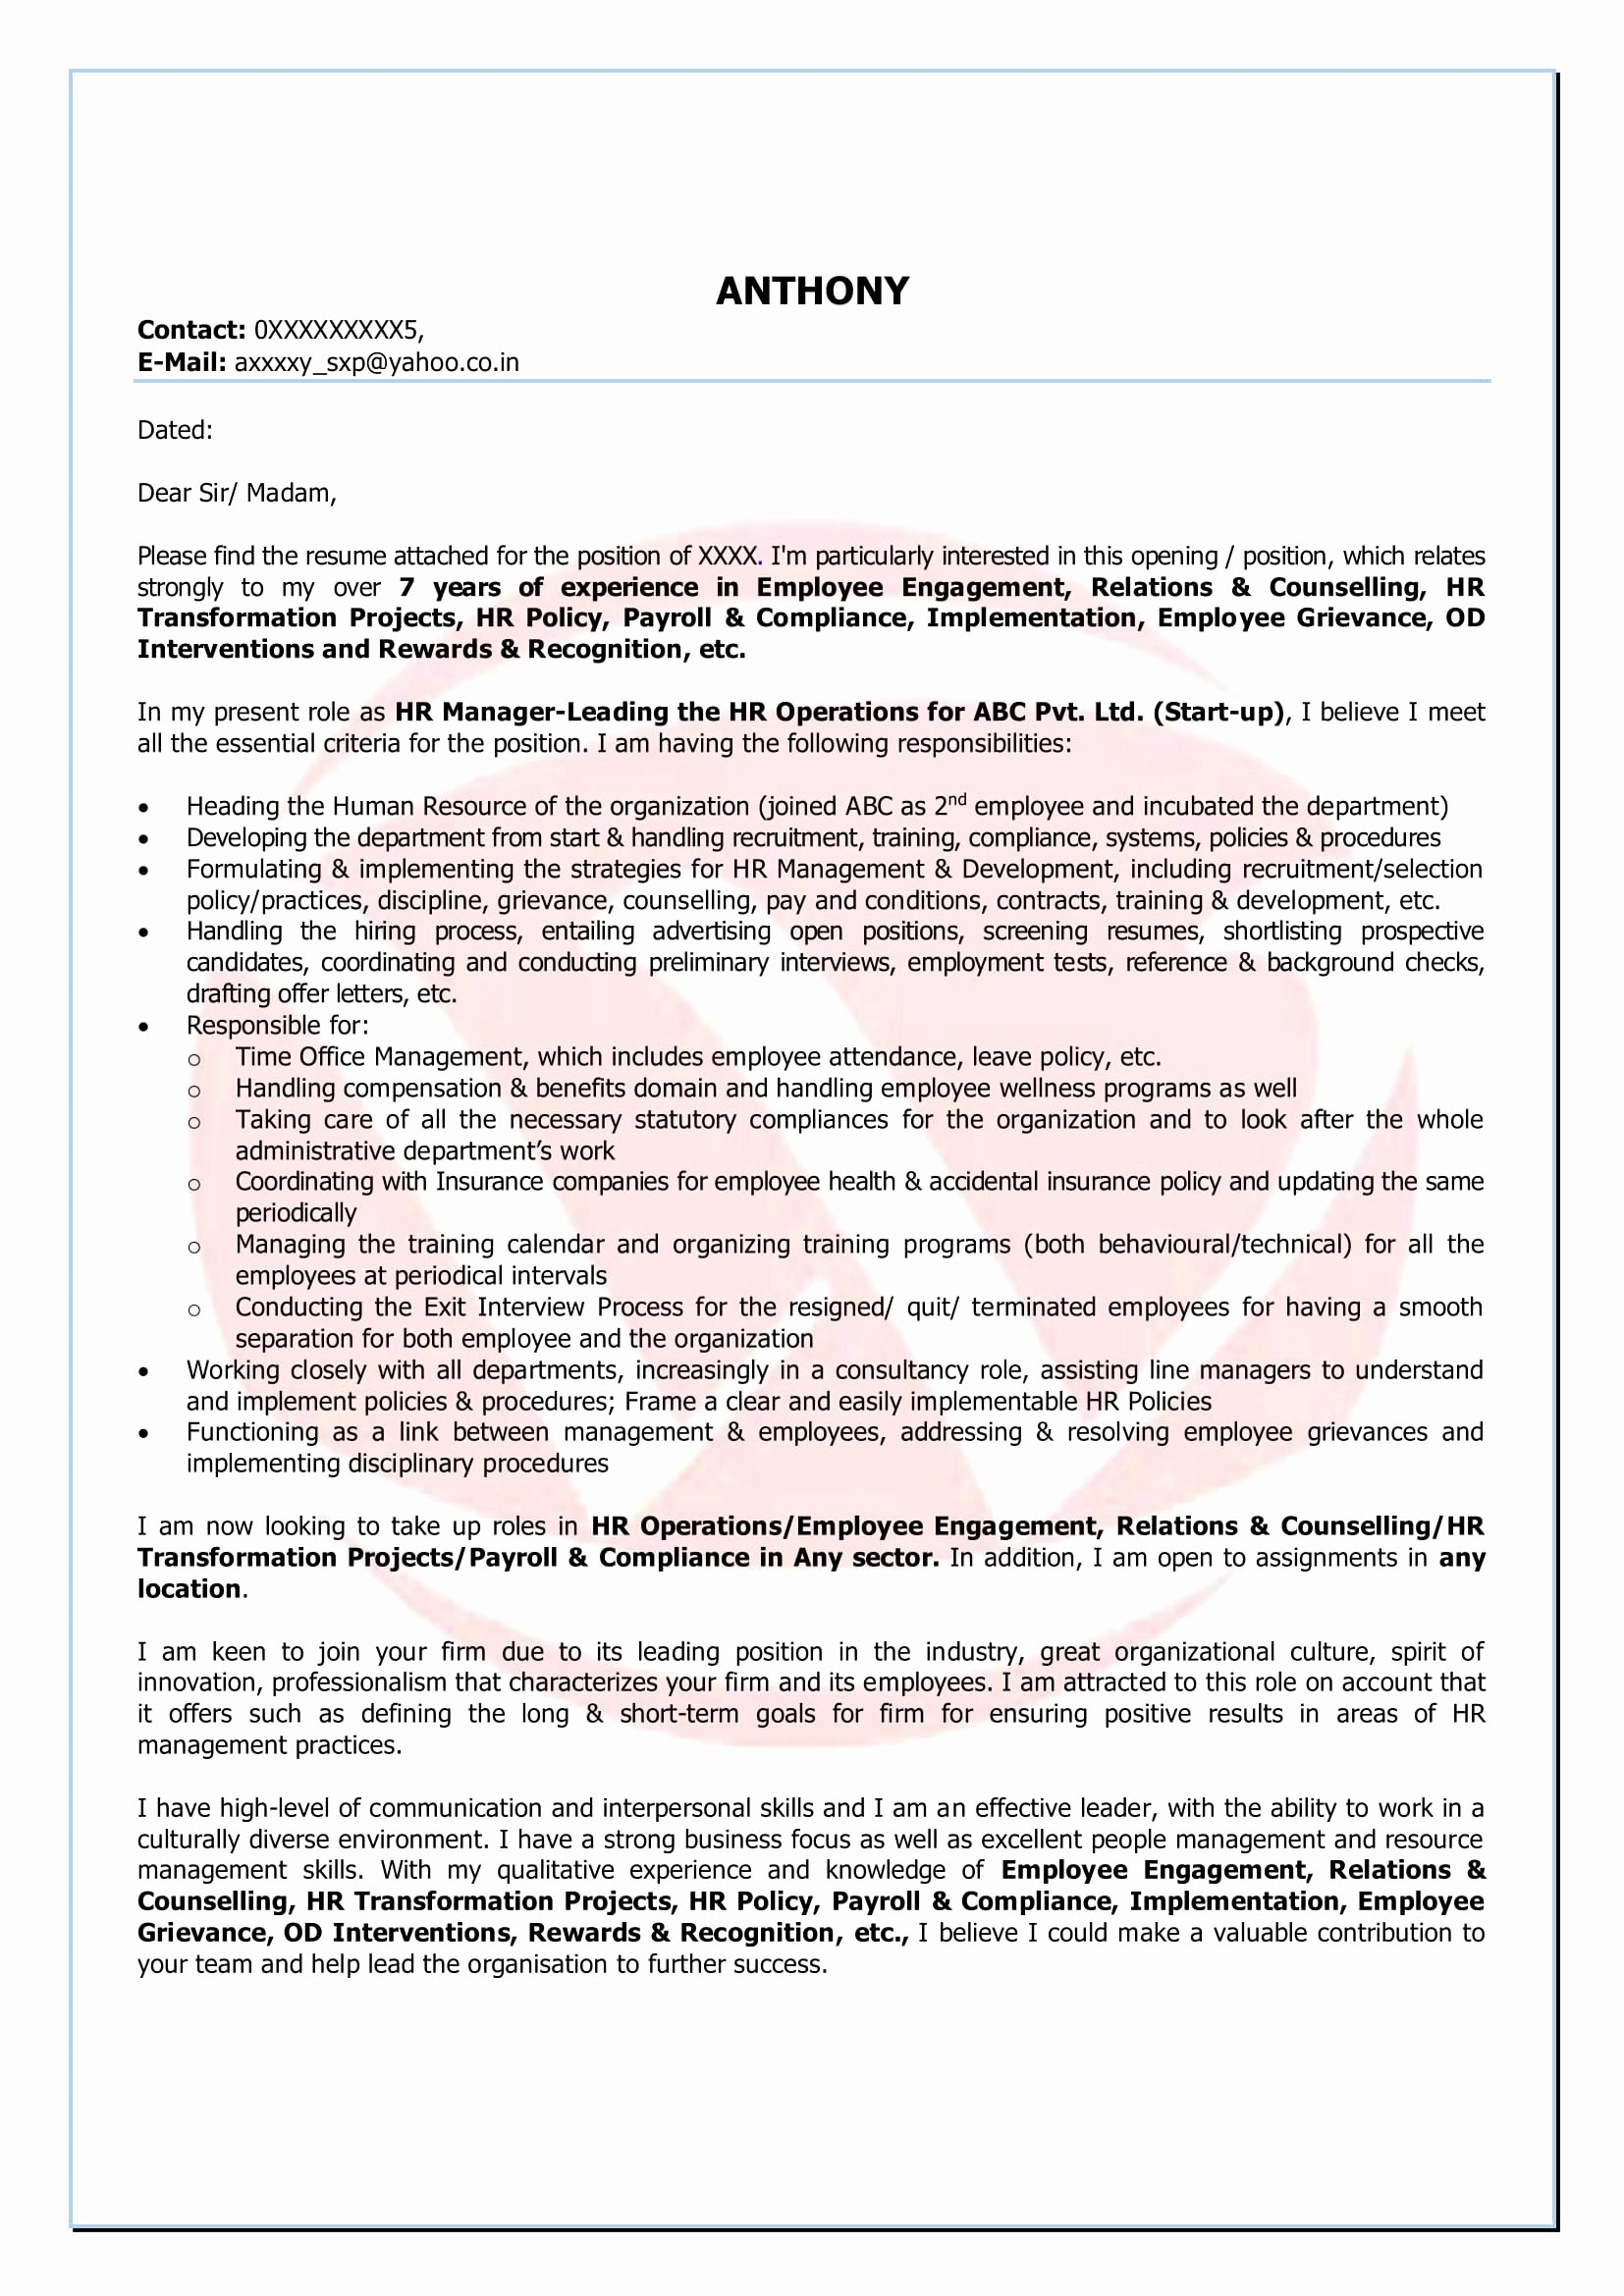 Sample Open Enrollment Letter to Employees Best Of Open Enrollment Template Letter Sample